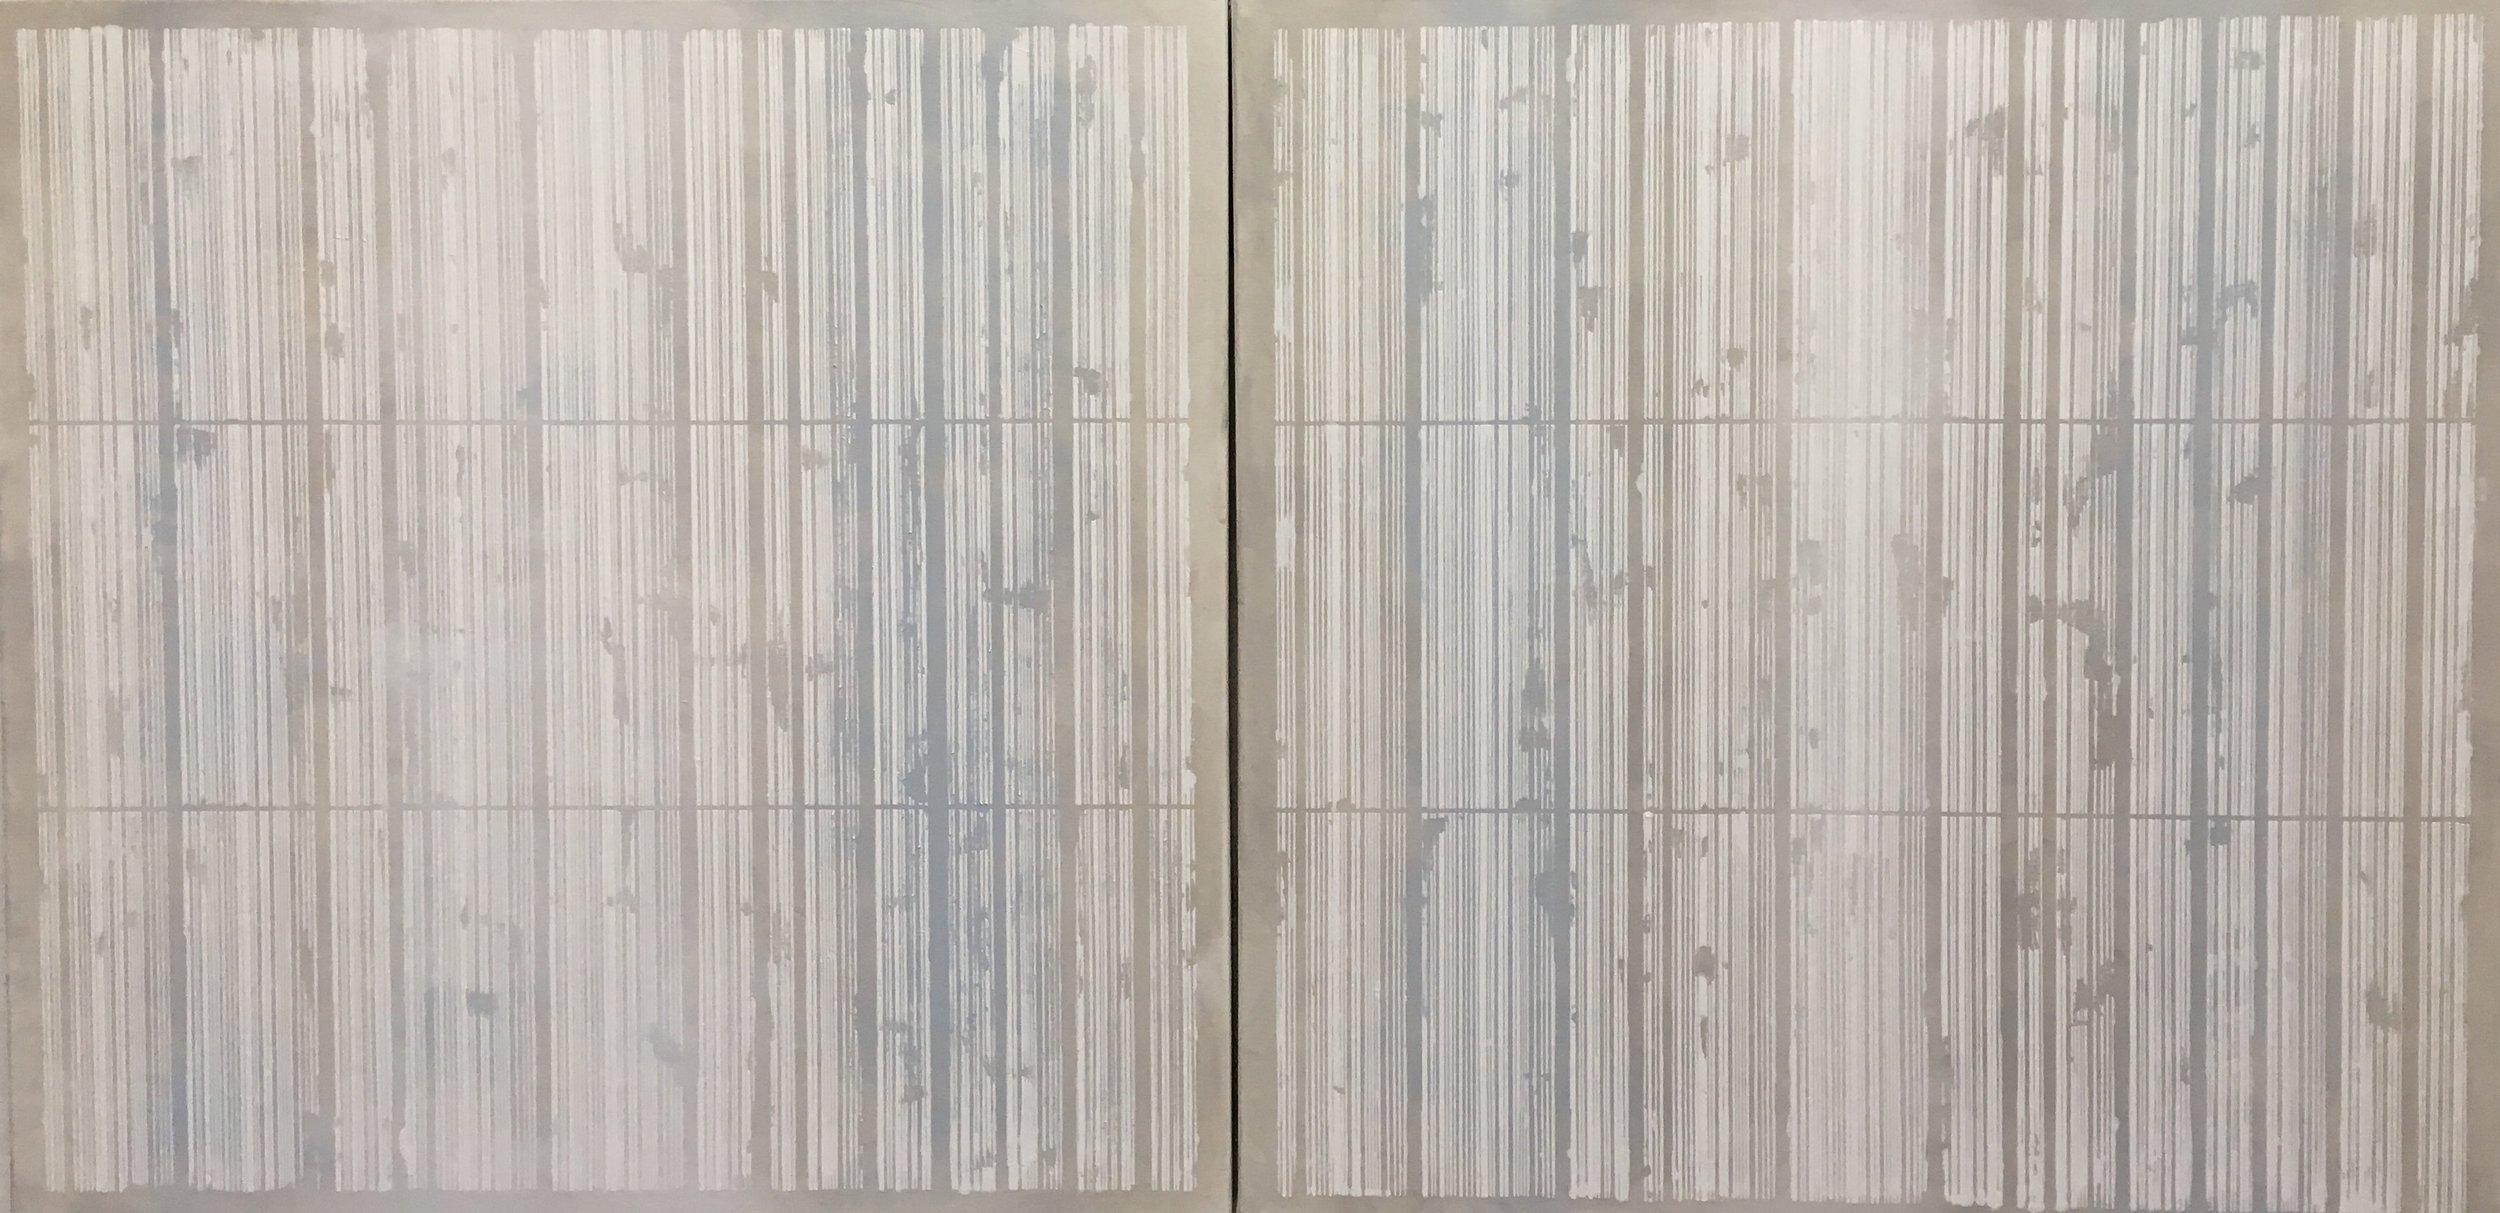 "Light blue and grey bar codes, 2 panels 36"" x 36"" each"